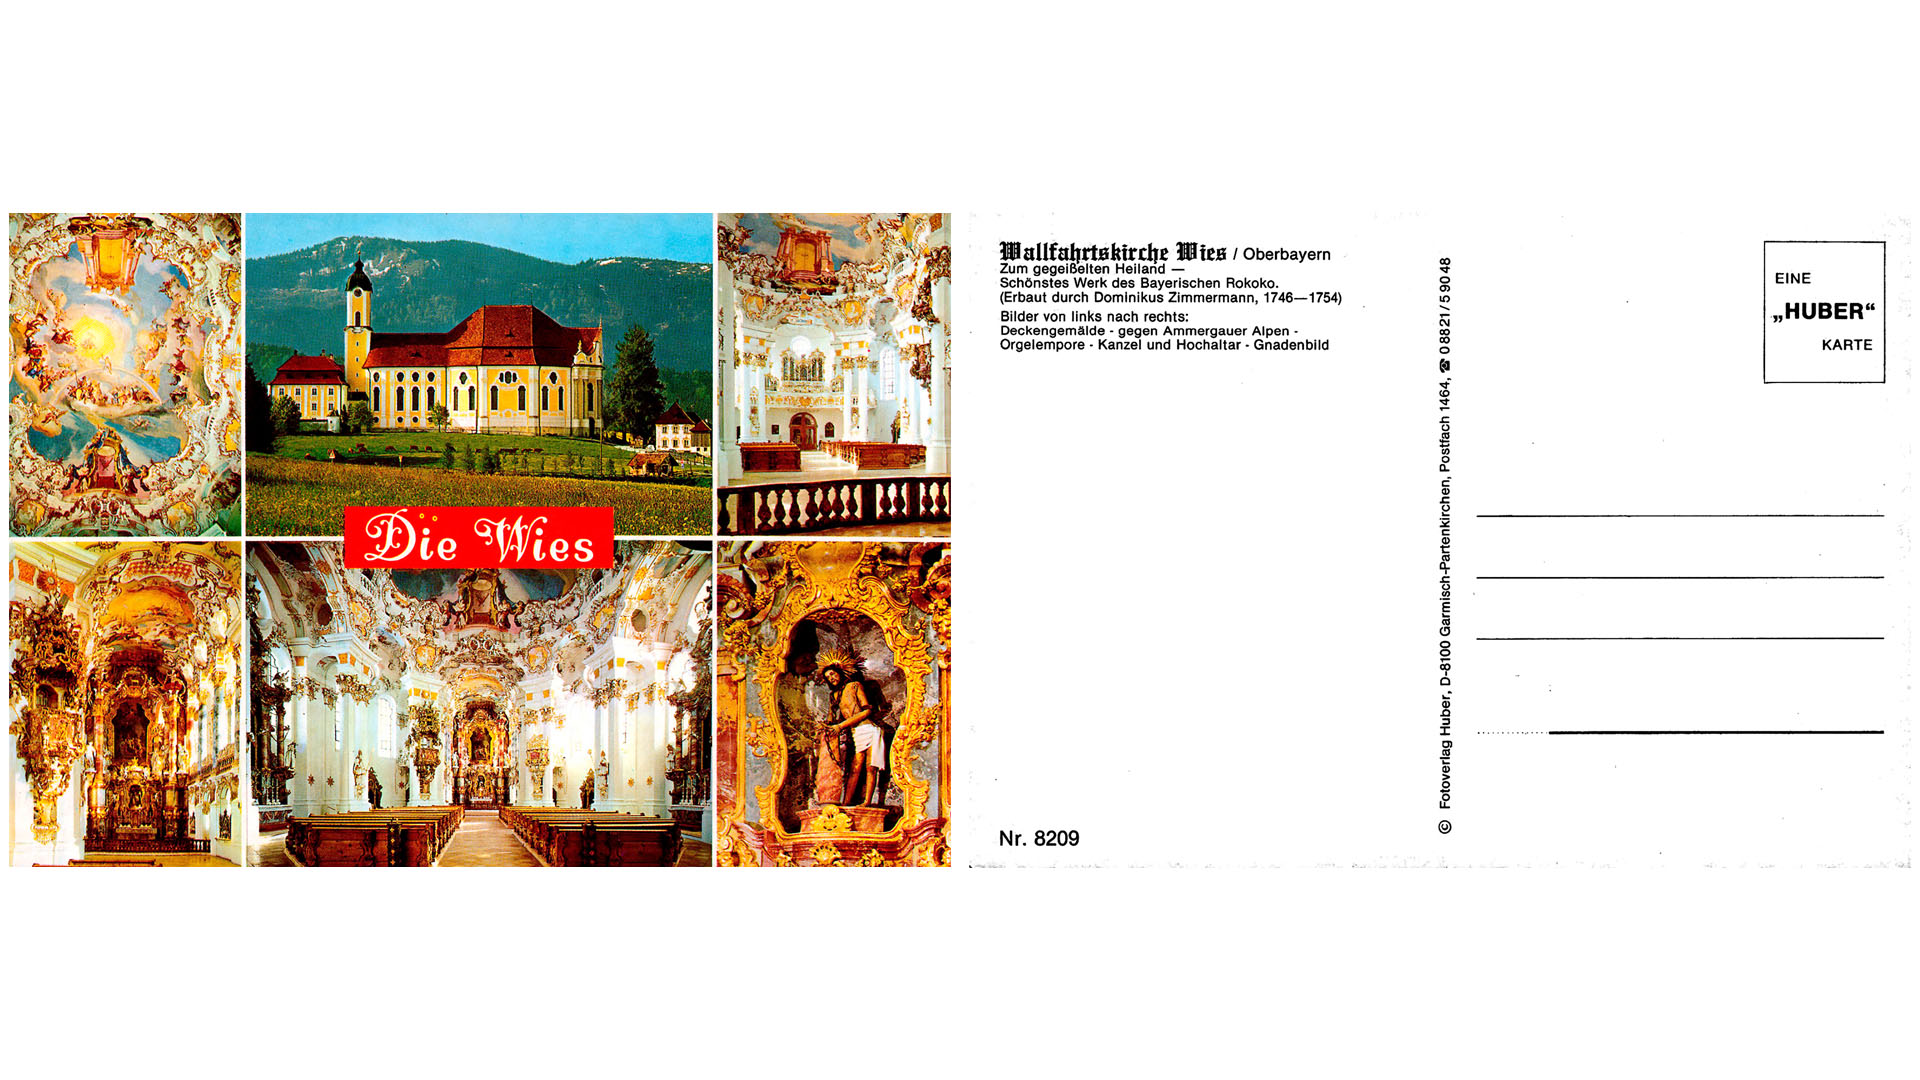 Wies - Wallfahrtskirche